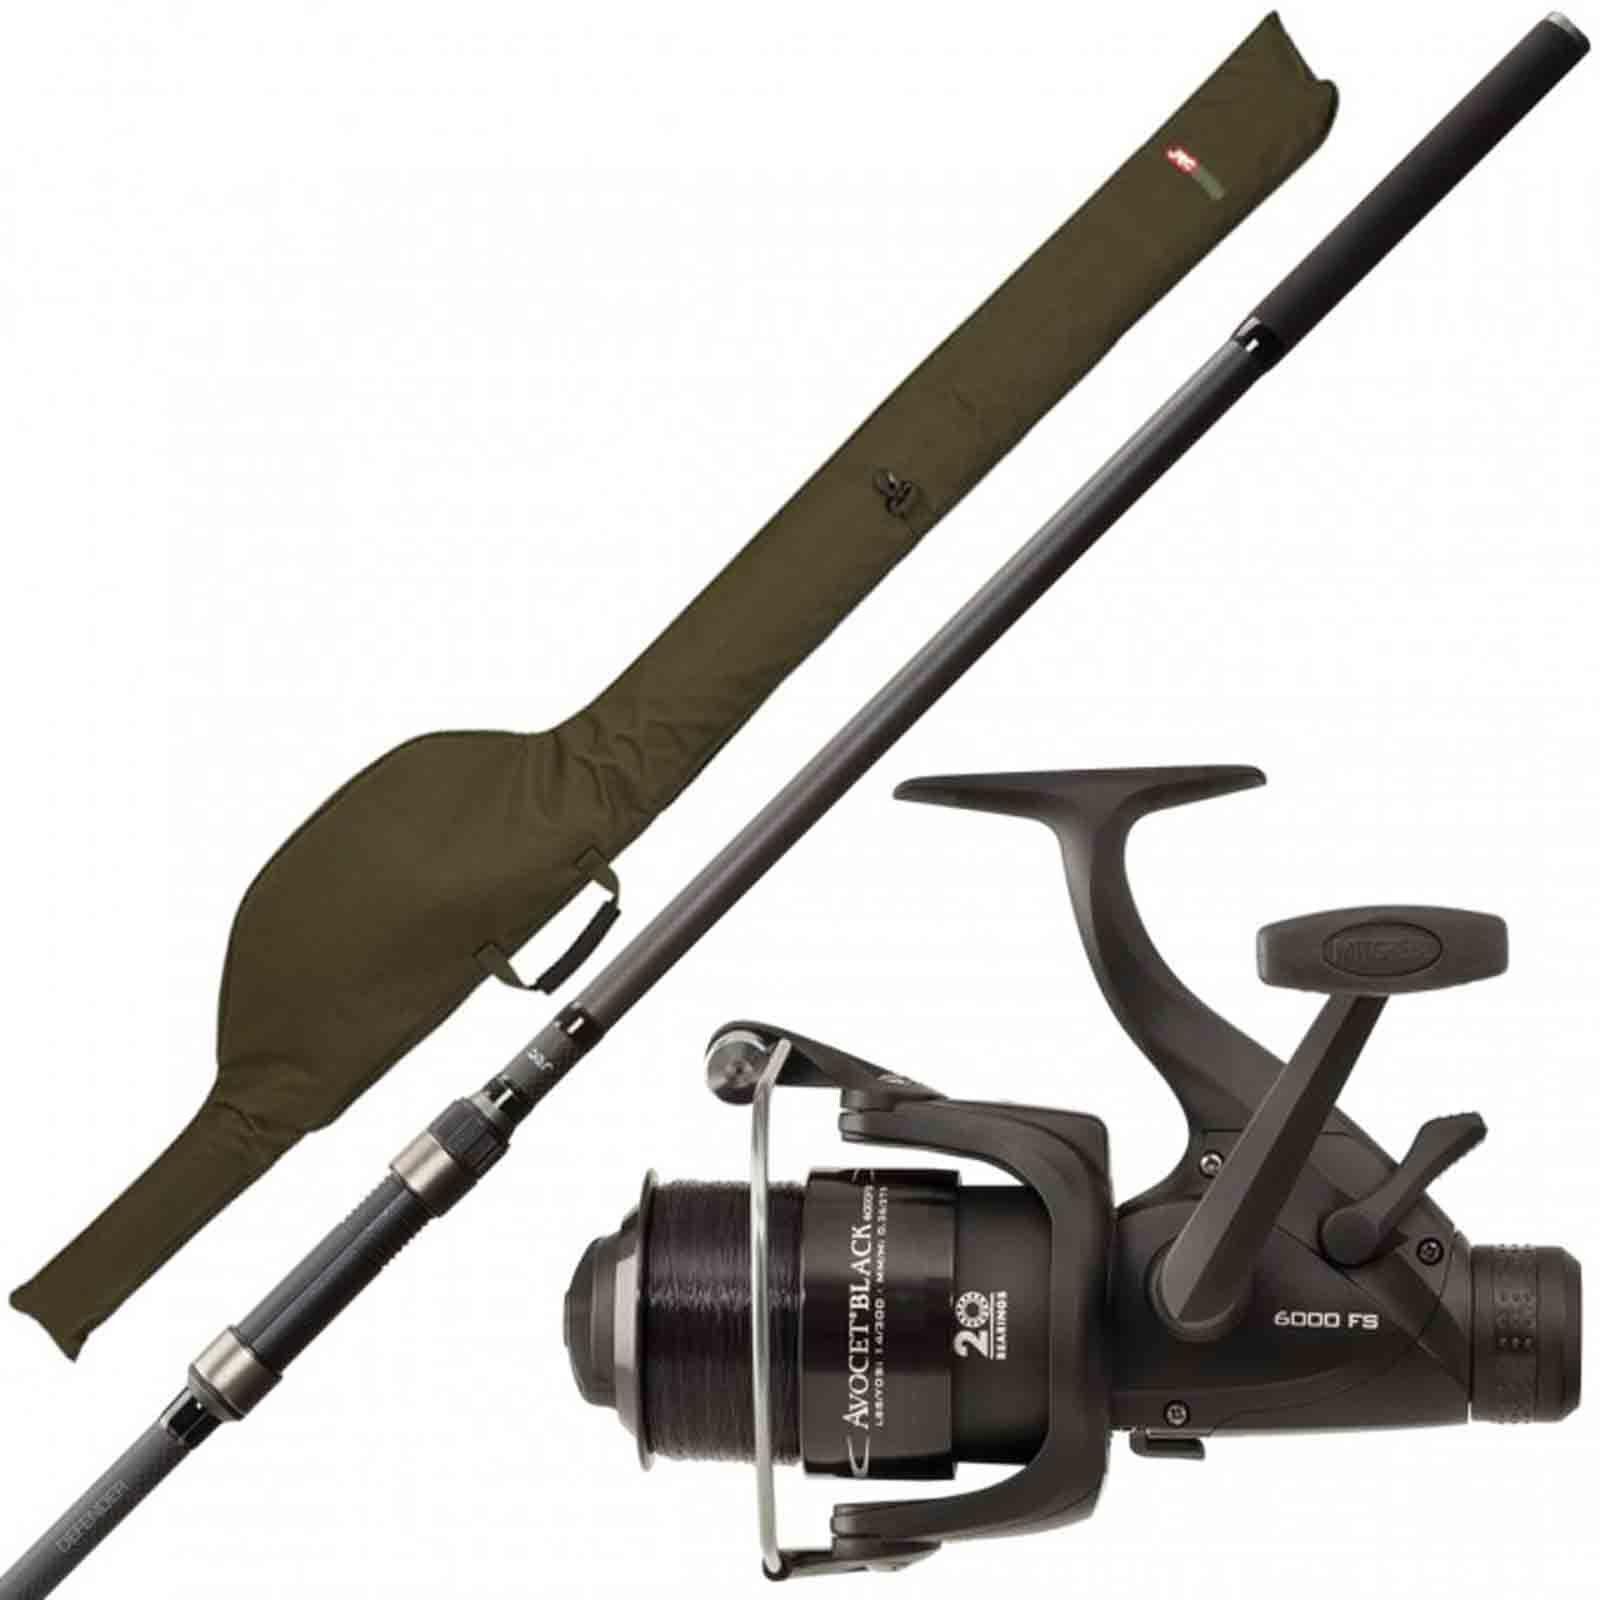 JRC Defender Rod & Reel Combo - 12ft 3 Piece Rod, Avocast 6000 Reel + Sleeve